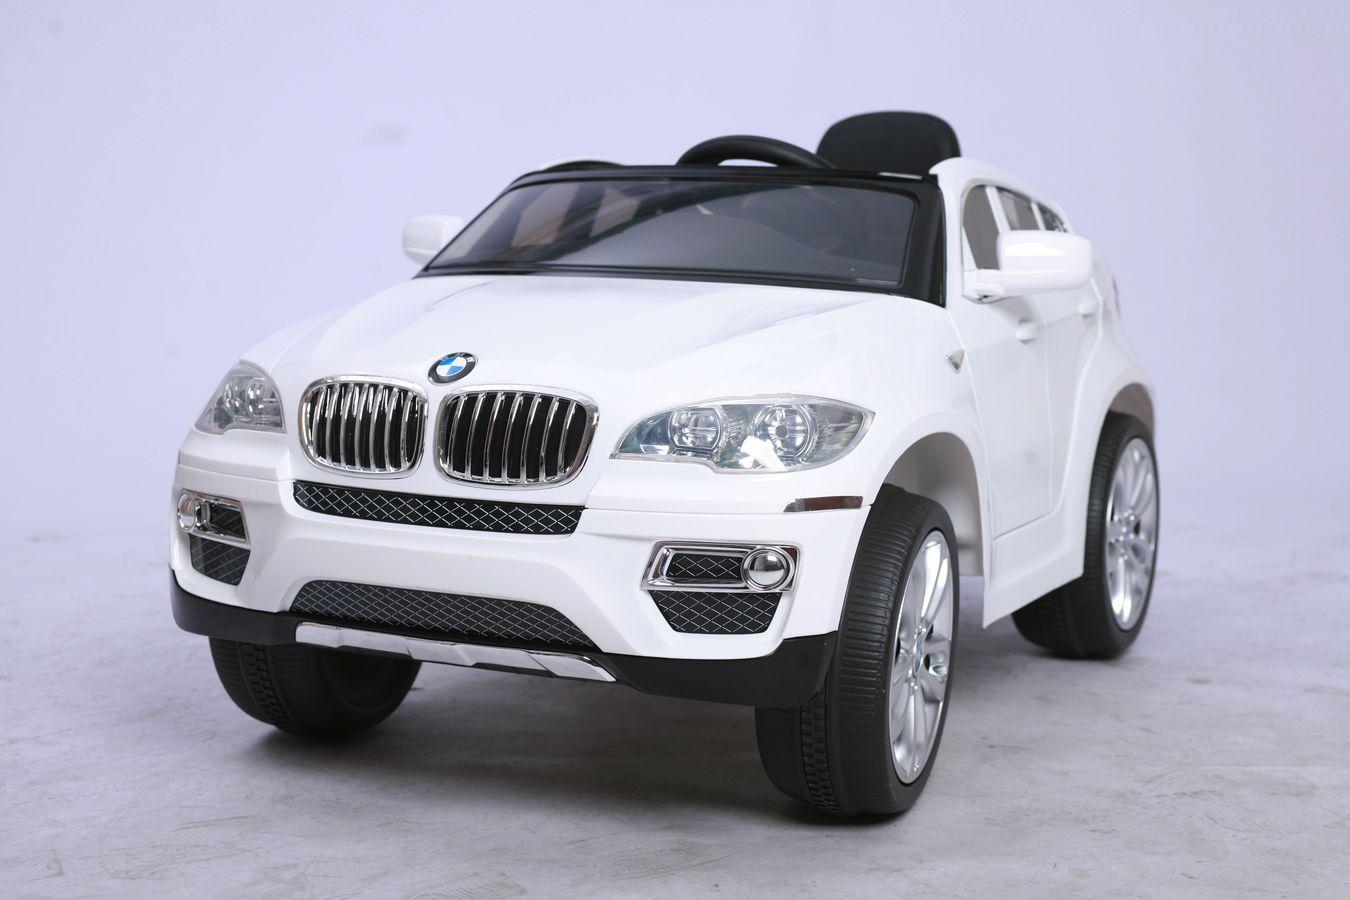 voiture bmw x6 image voiture bmw x6 images voiture bmw x6 activehybrid luxury club voiture de. Black Bedroom Furniture Sets. Home Design Ideas